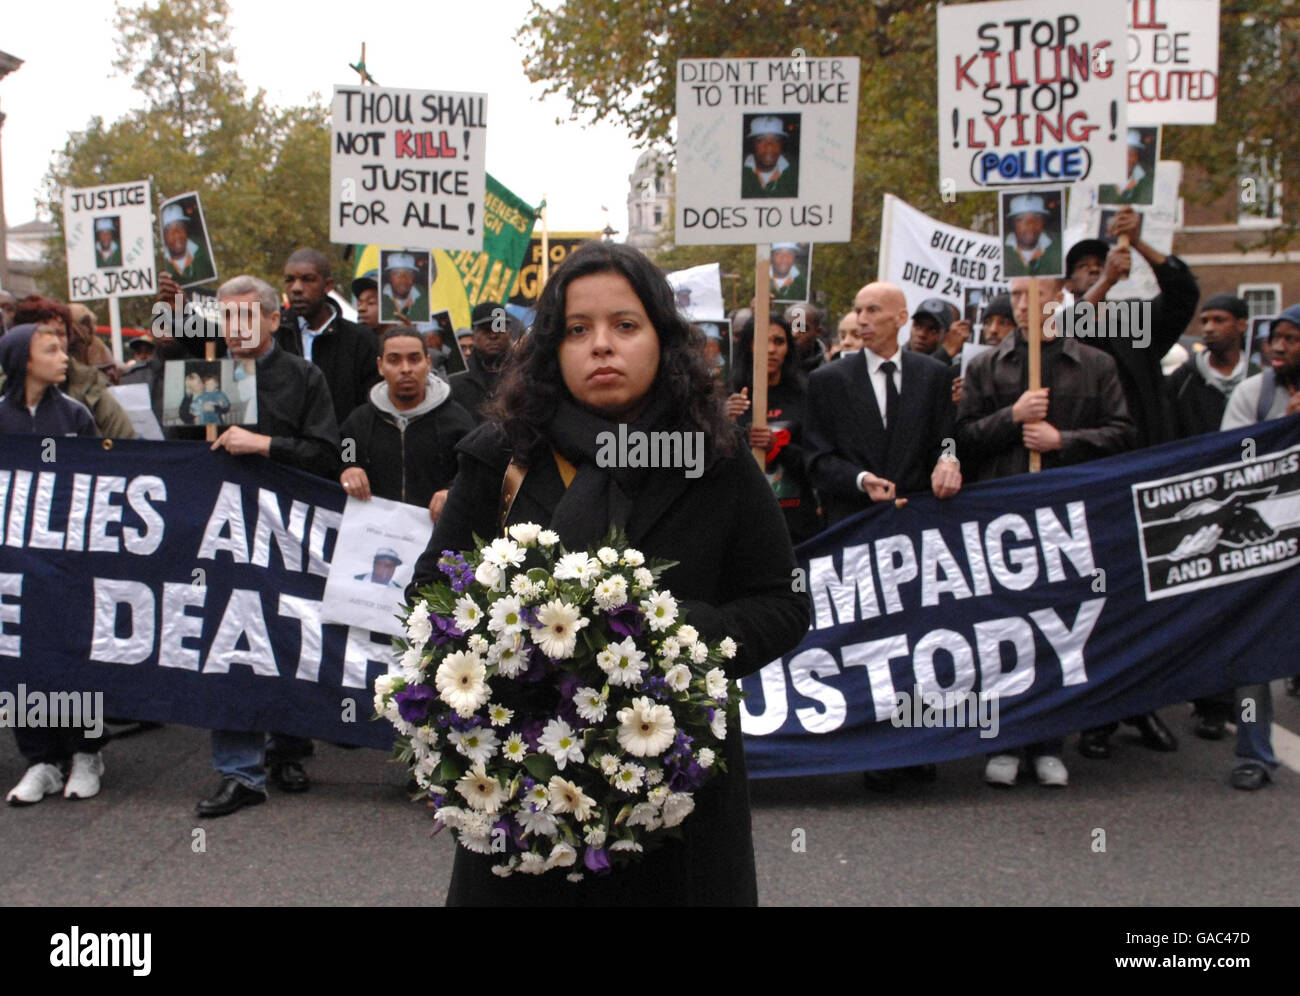 Menezes' cousin leads deaths in custody demo - Stock Image